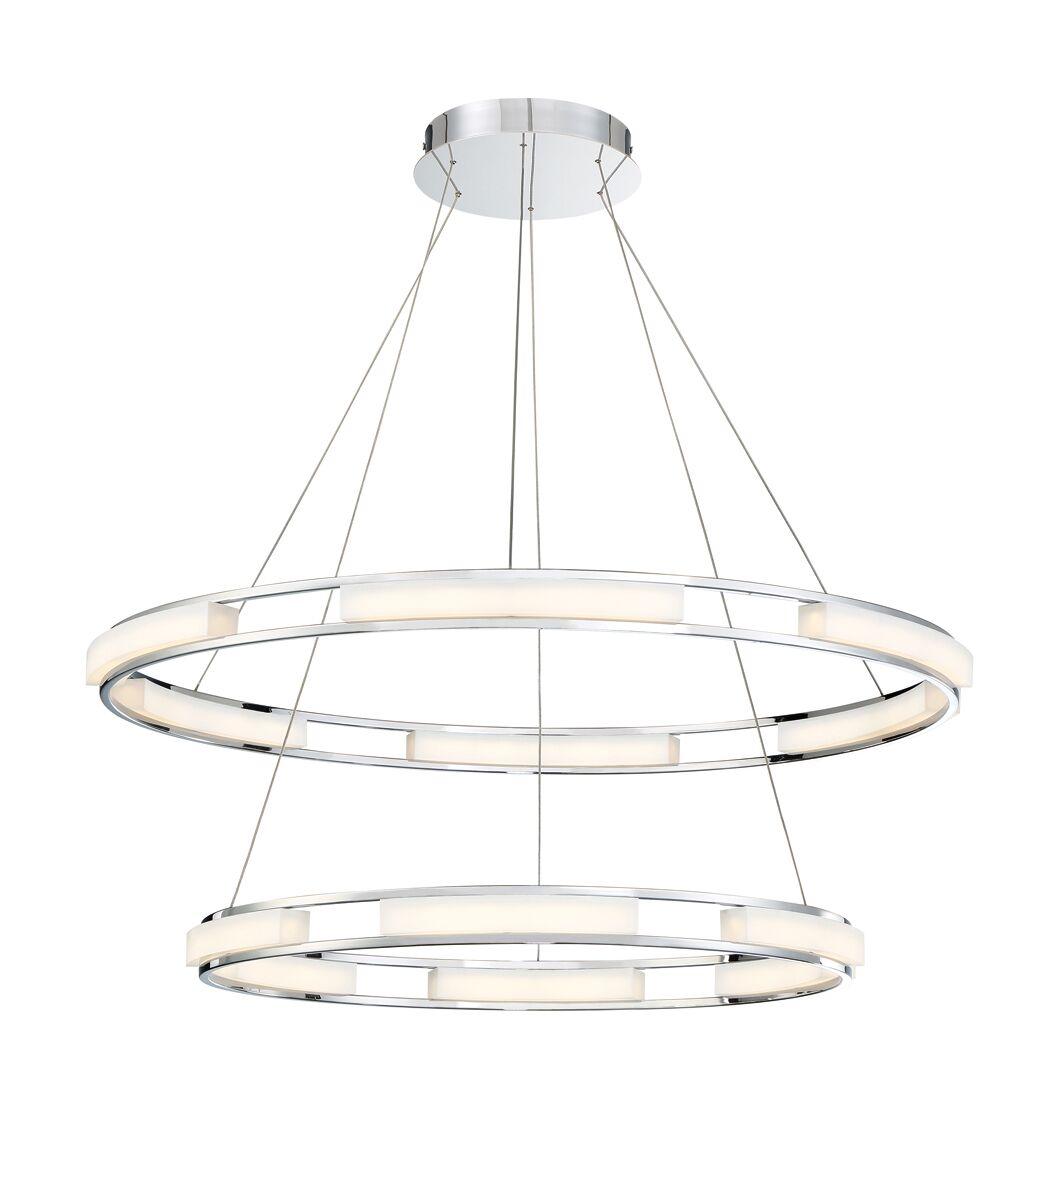 Sturtz 8-Light LED Geometric Chandelier